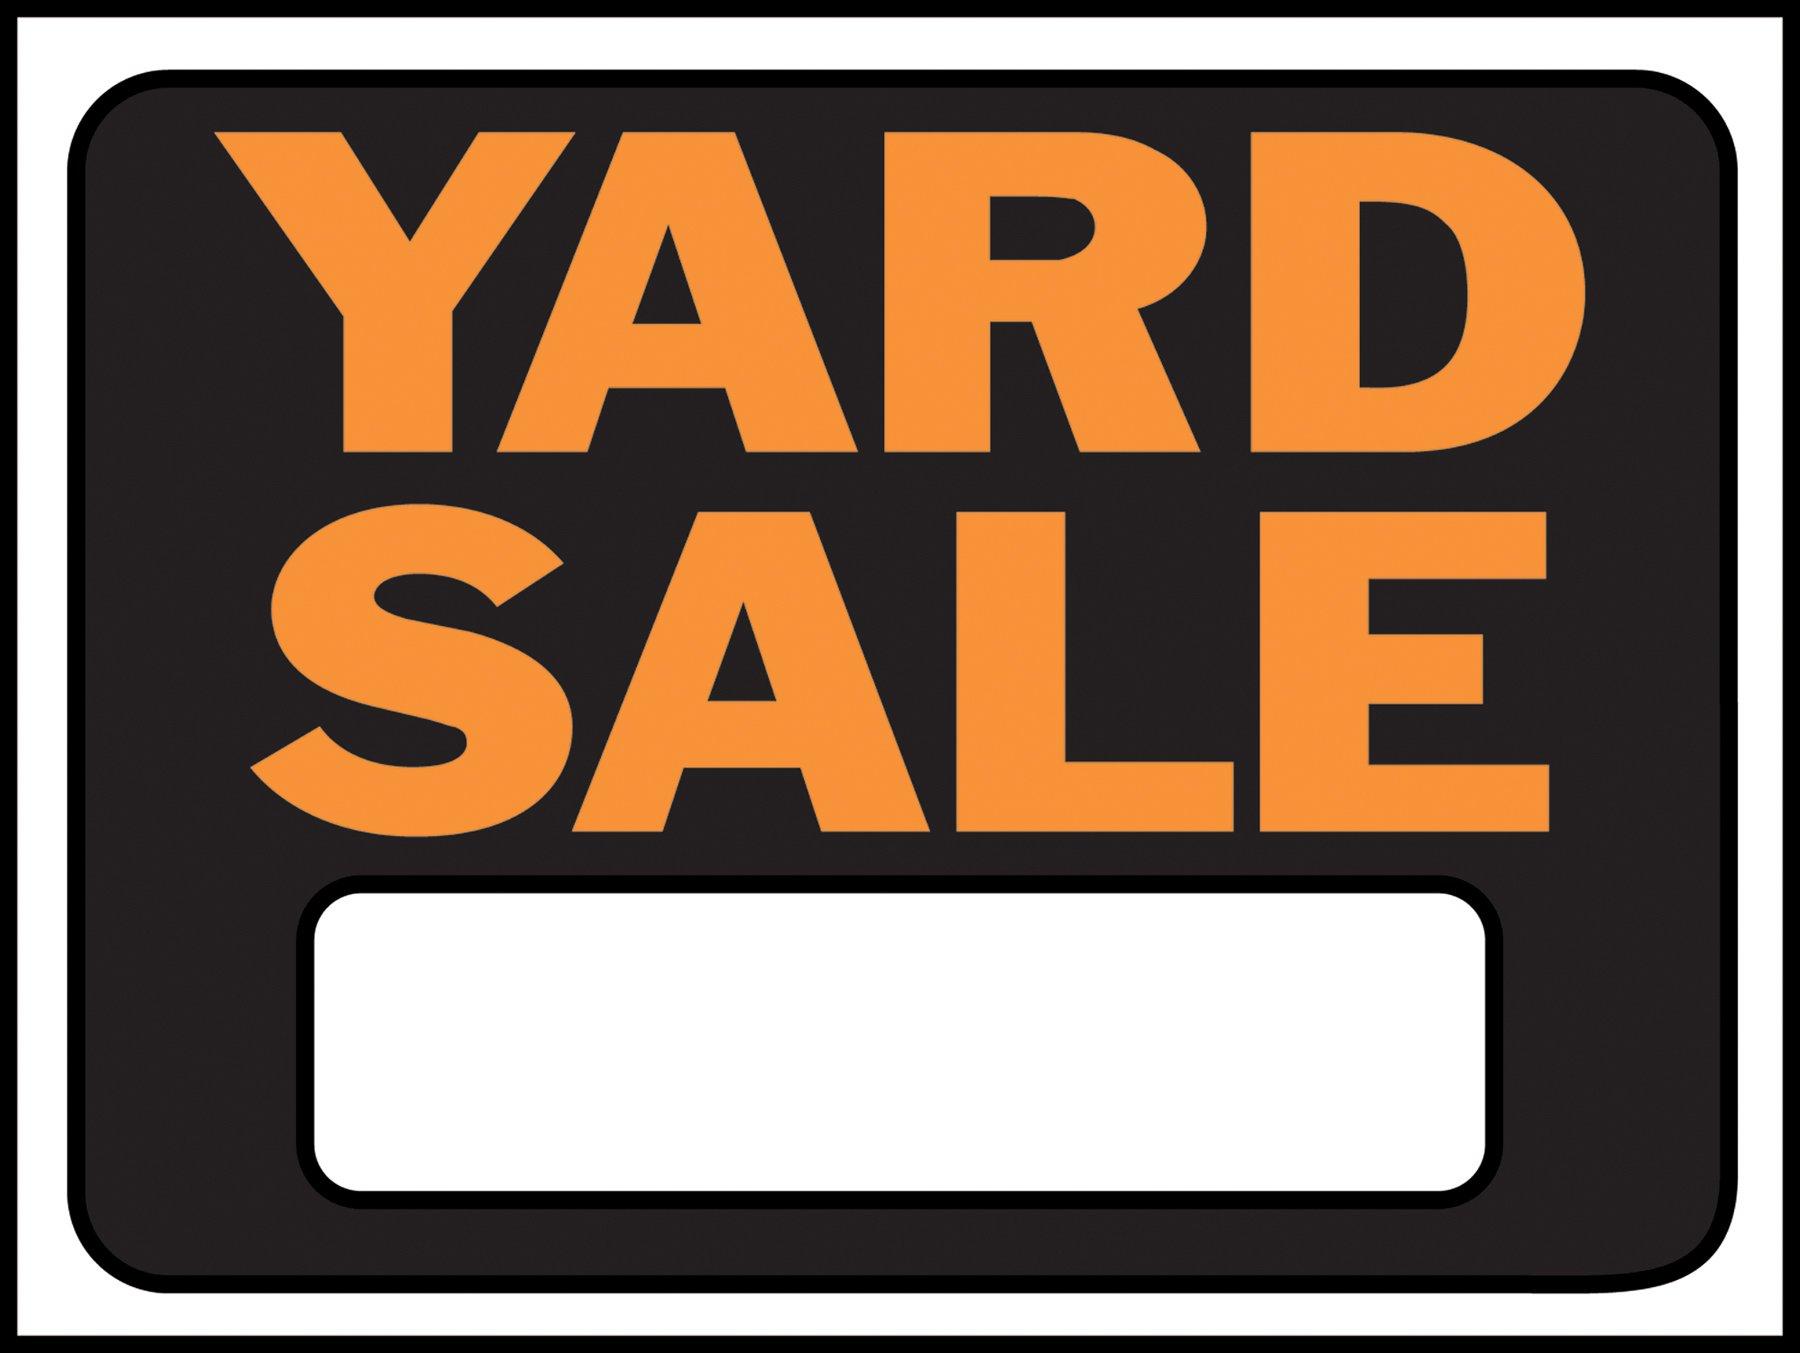 Hy-Ko Products 3033 Yard Sale Plastic Sign 8.5'' x 12'' Orange/Black, 1 Piece